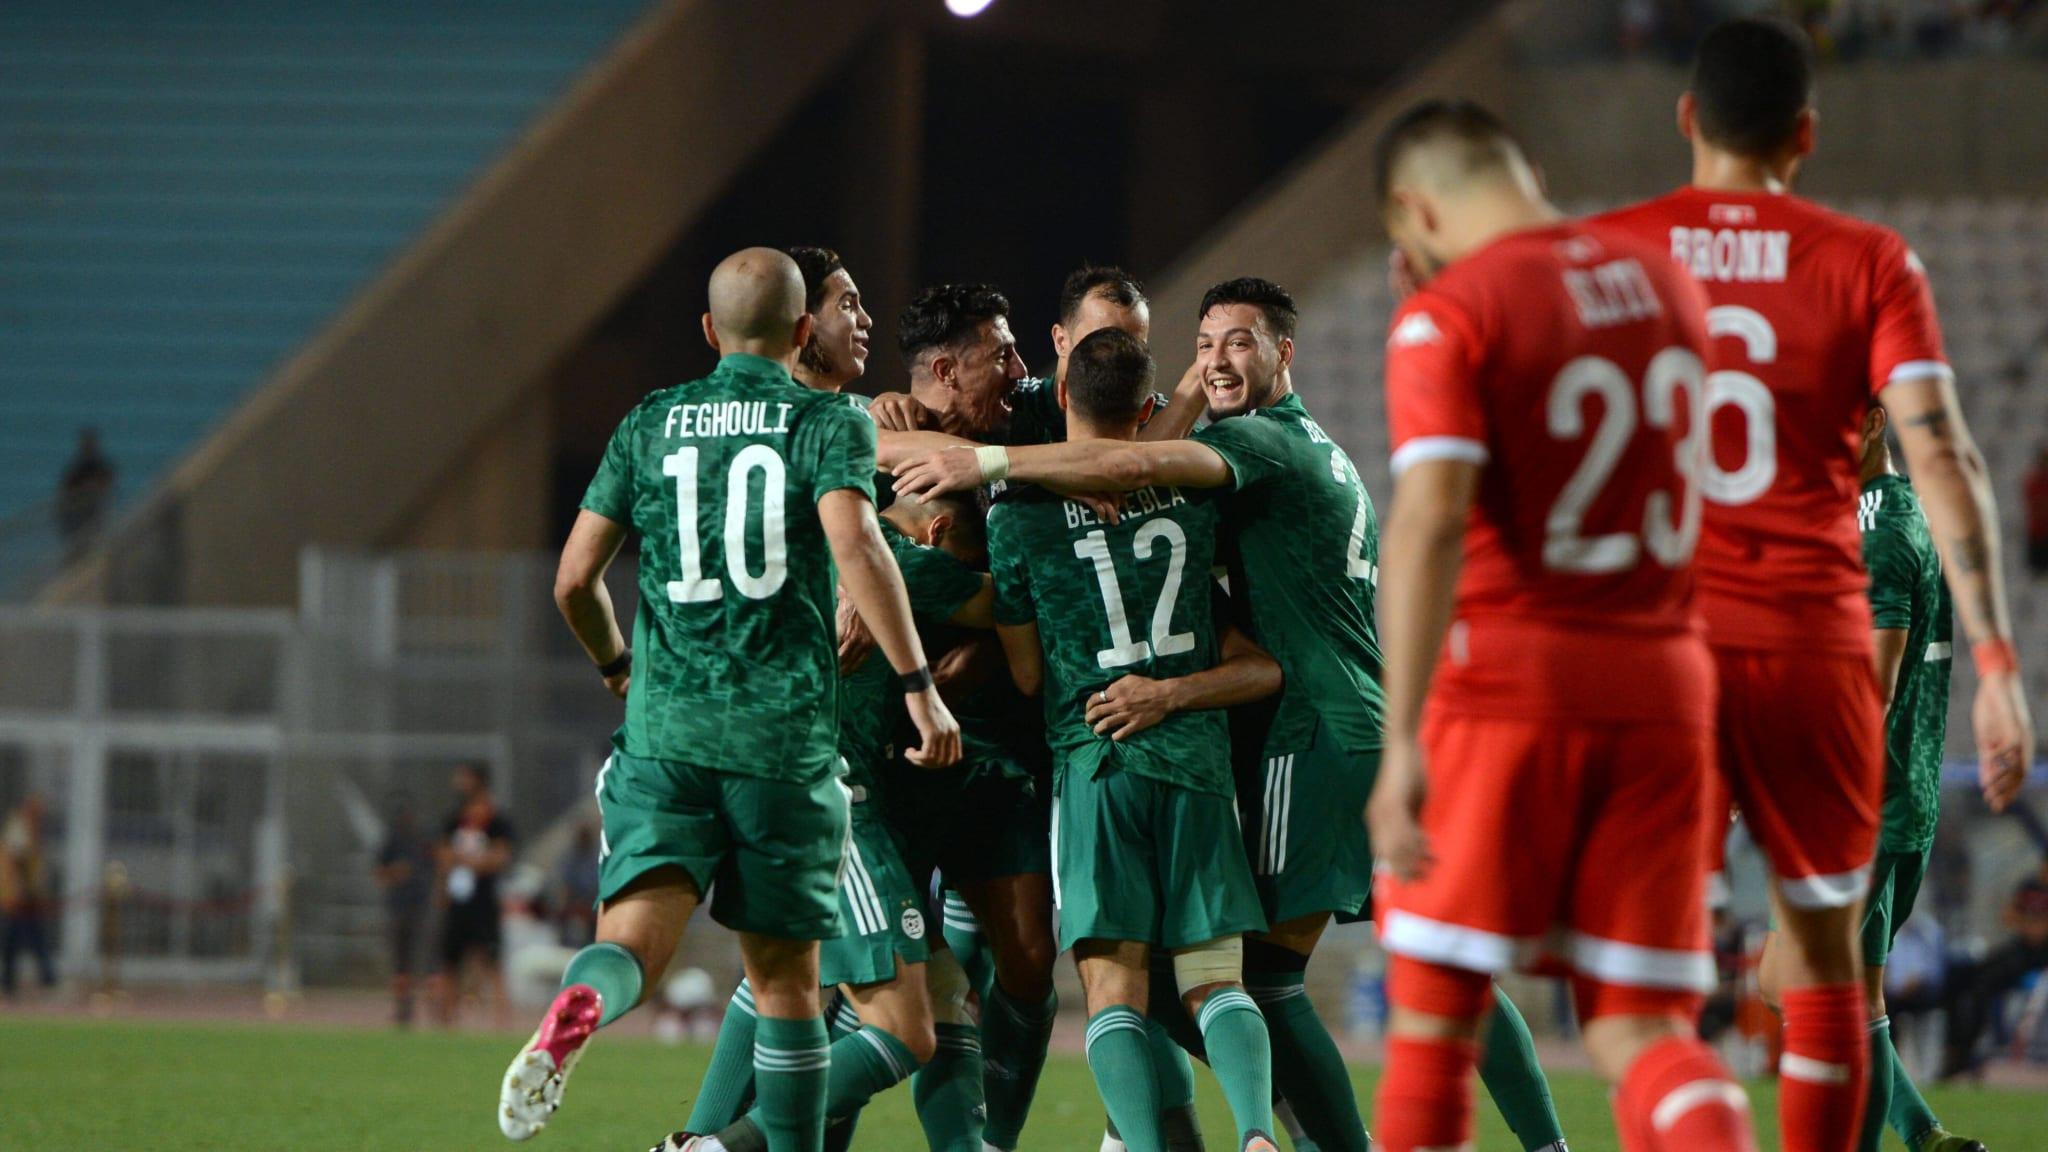 Riyad Mahrez(7) of Algeria celebrates his goal against Tunisia